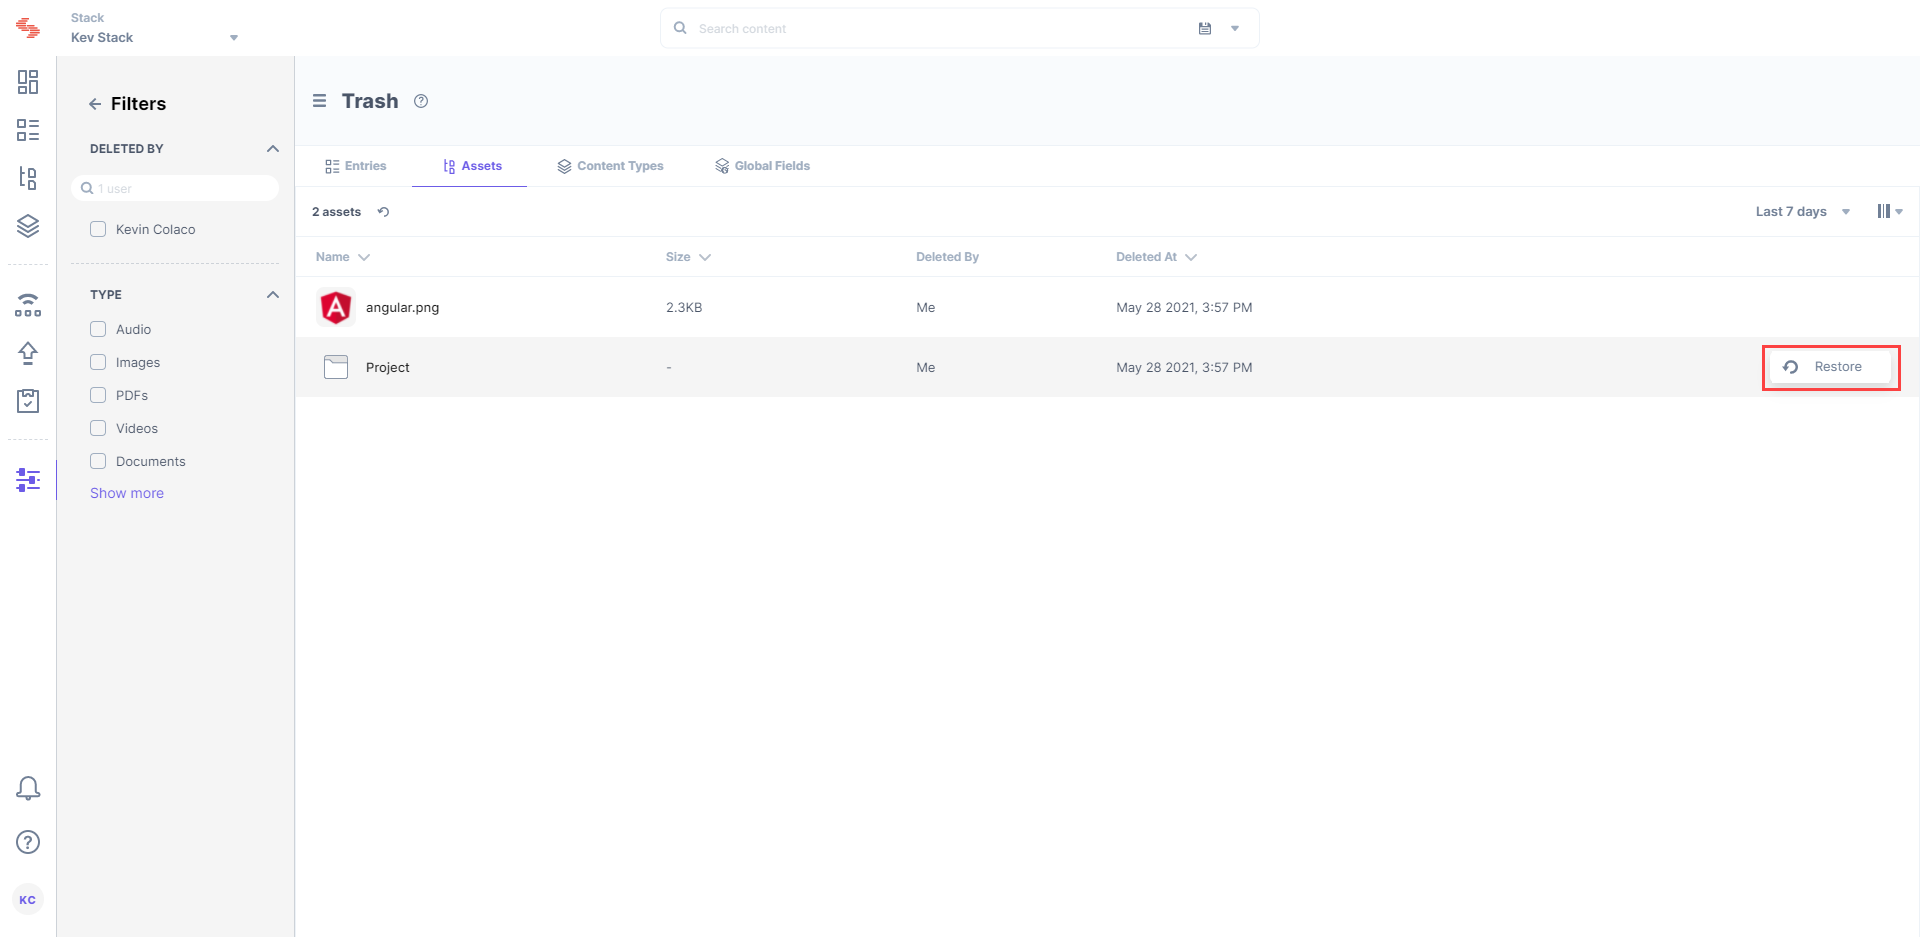 Restore_a_Deleted_Asset_Folder_2_highlighted.png